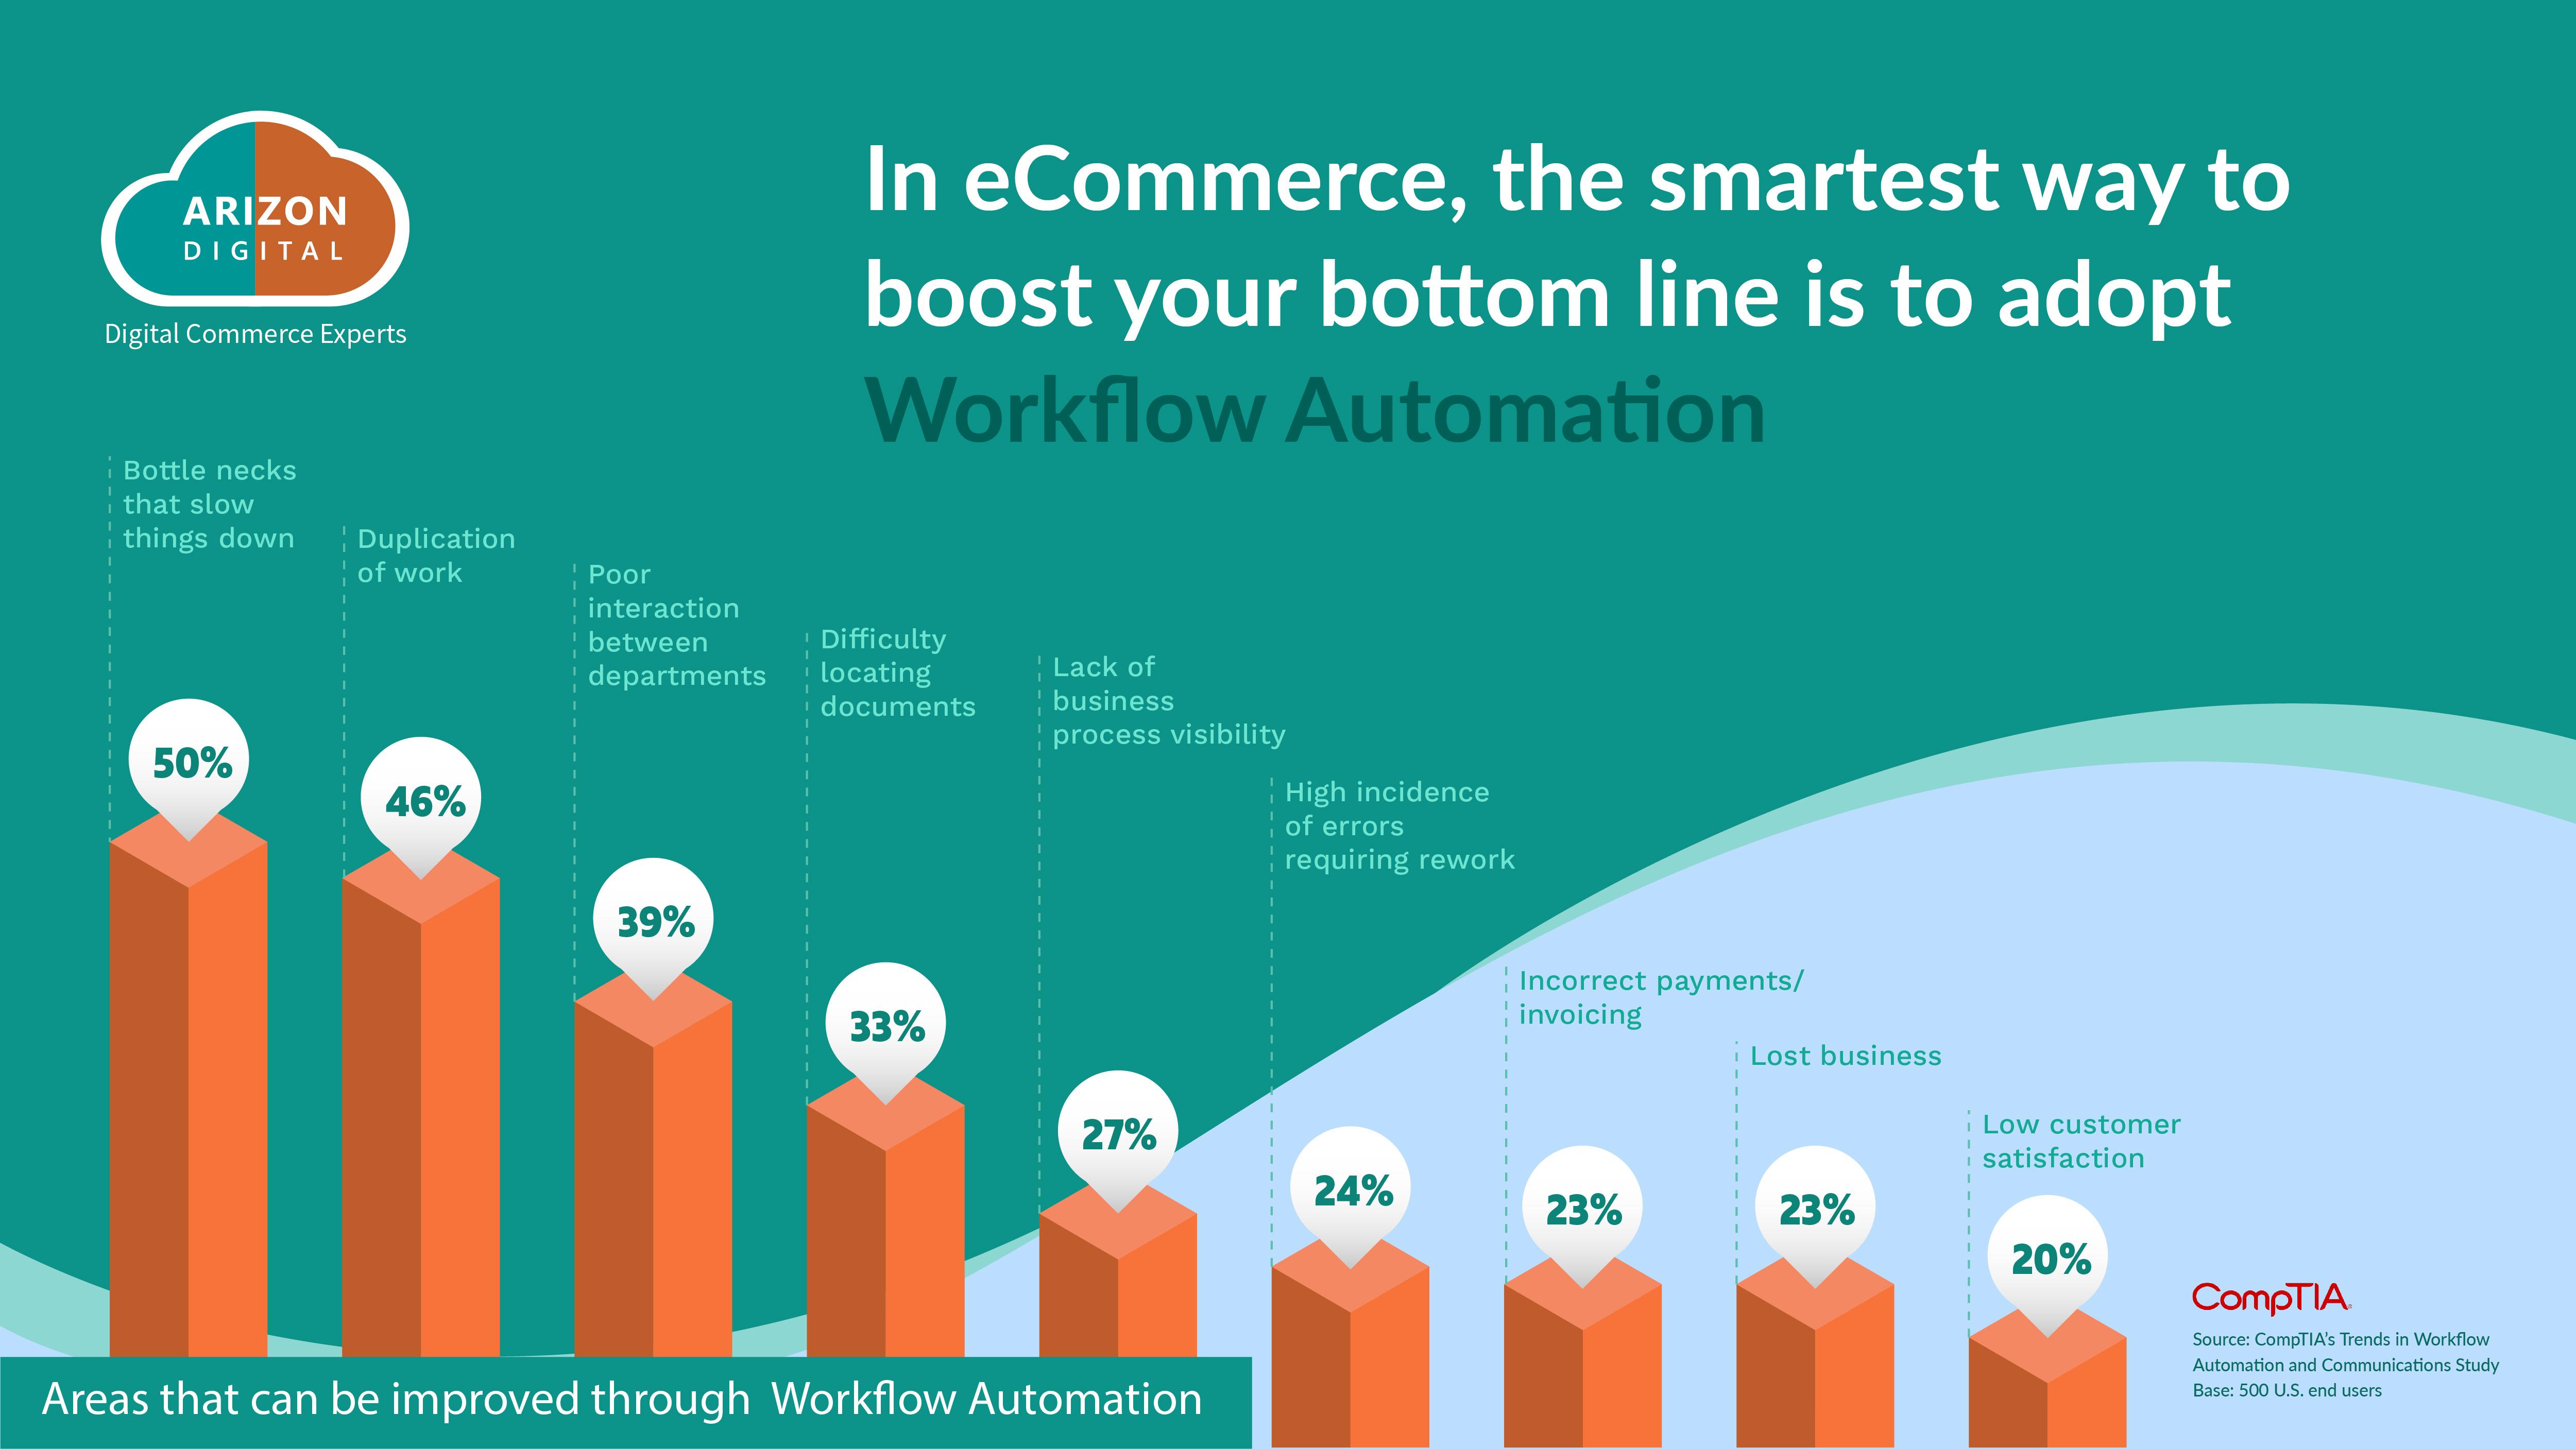 workflow-automations-arizon-digital-week